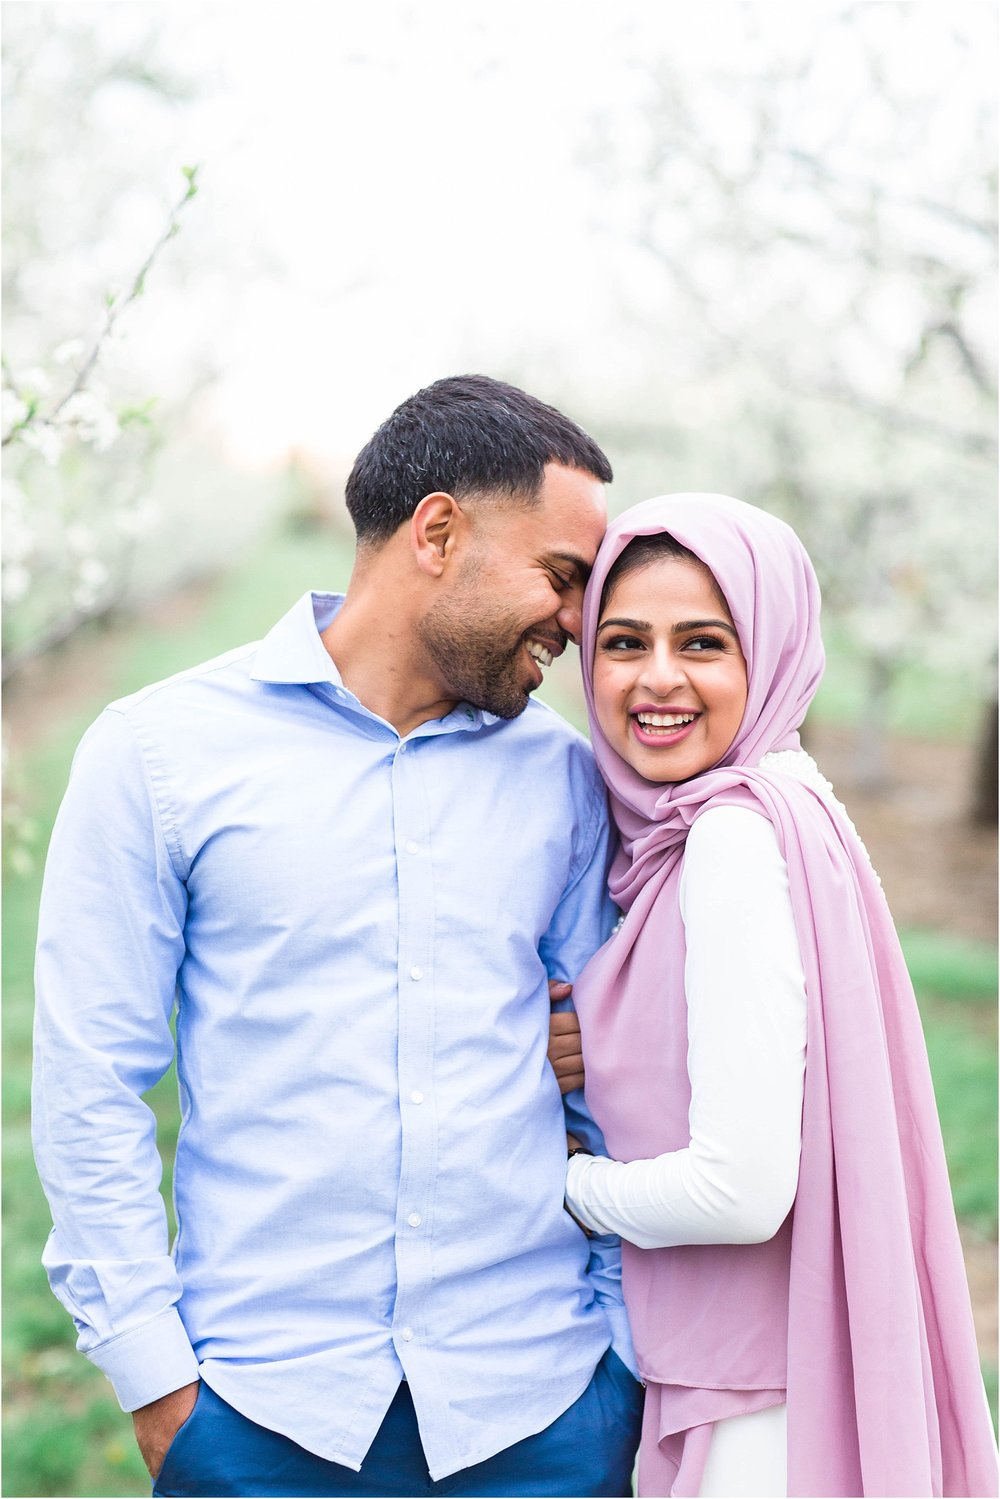 Niagara-on-the-lake-cherry-blossom-farm-Engagement-Session-Toronto-Mississauga-Brampton-Scarborough-GTA-Pakistani-Indian-Wedding-Engagement-Photographer-Photography_0030.jpg